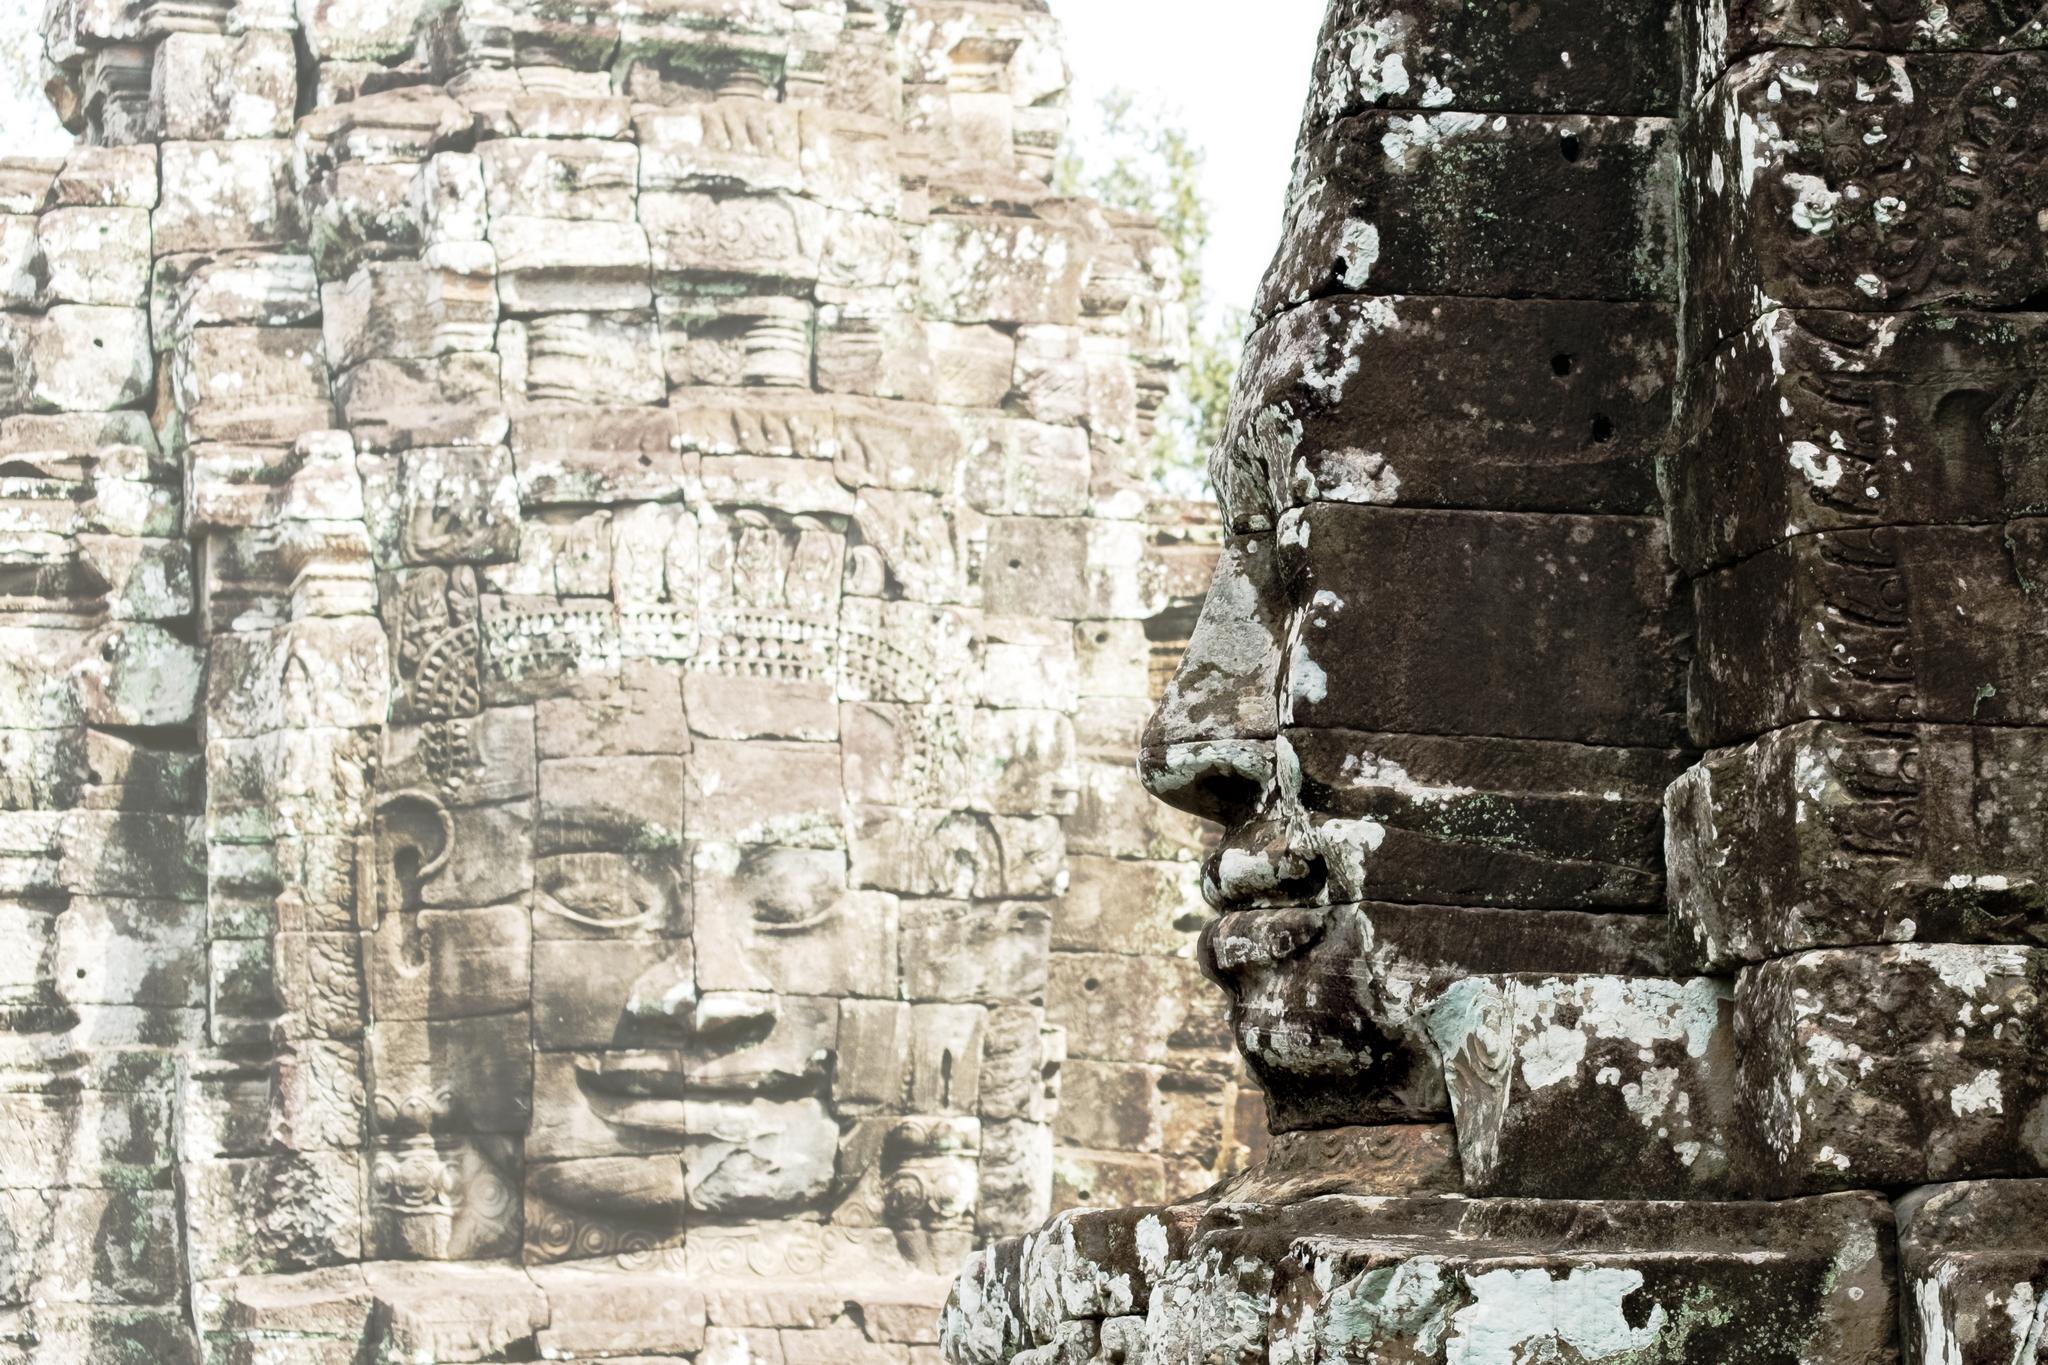 33. Cambodian Faces